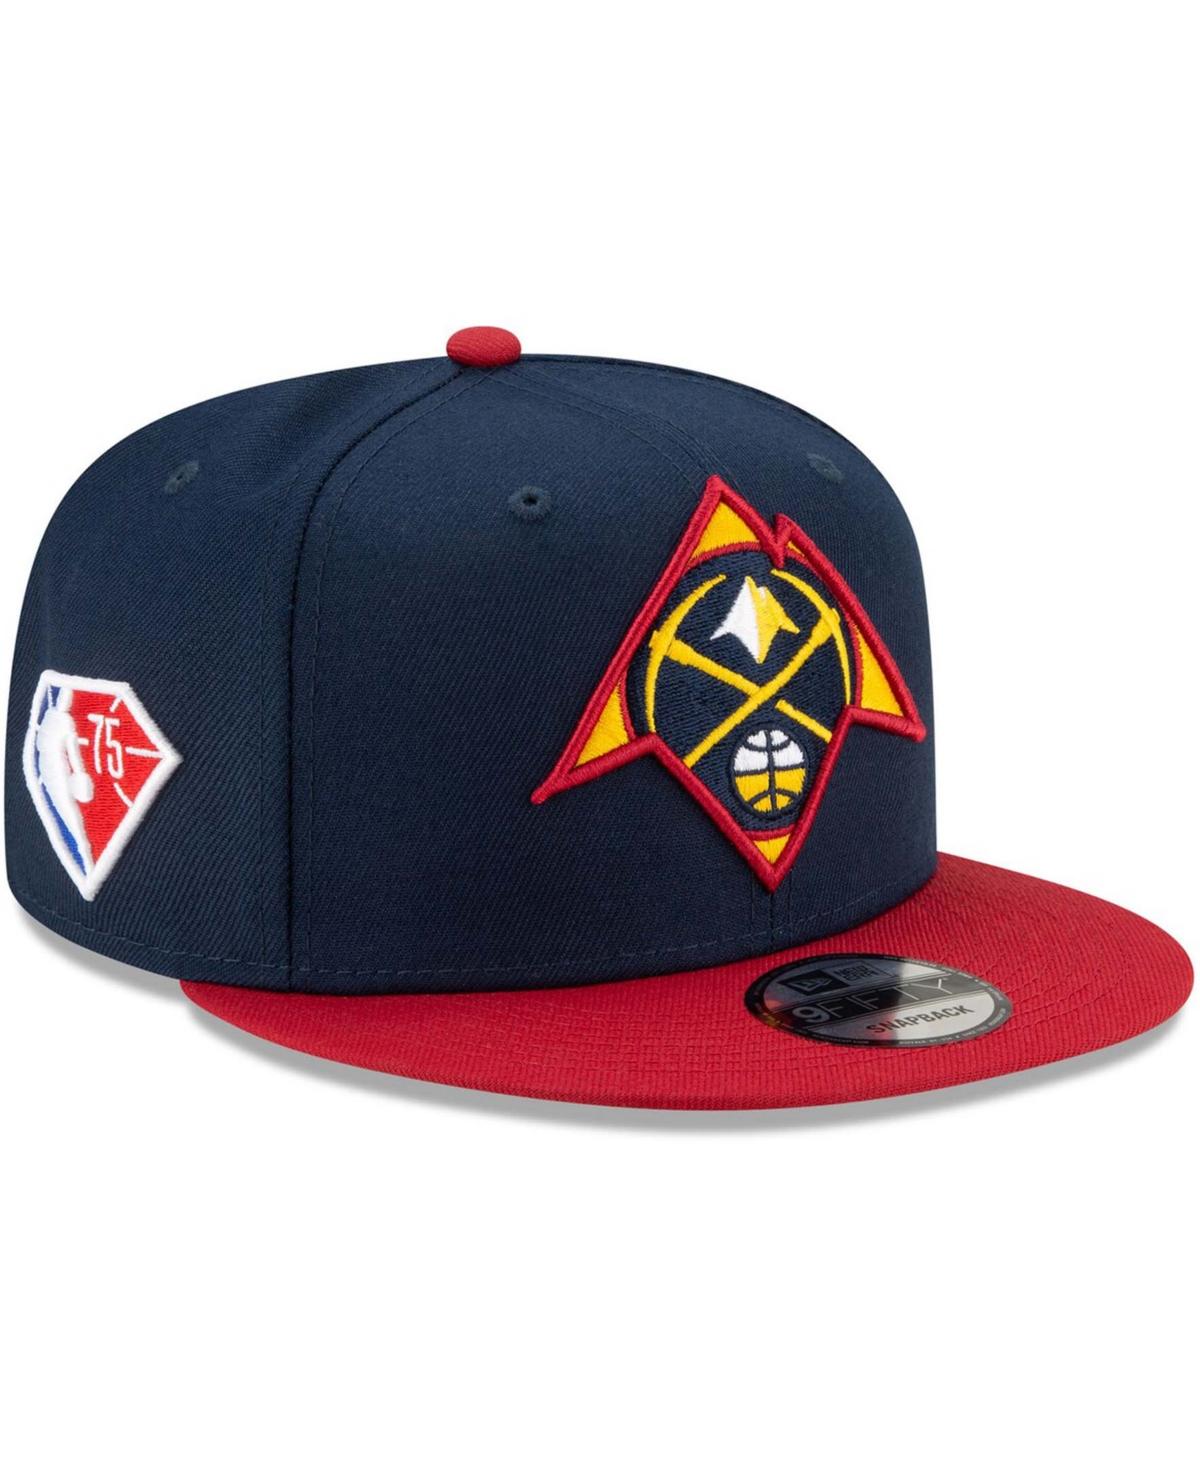 Men's Navy, Red Denver Nuggets 2021 Nba Draft On-Stage 9Fifty Snapback Adjustable Hat